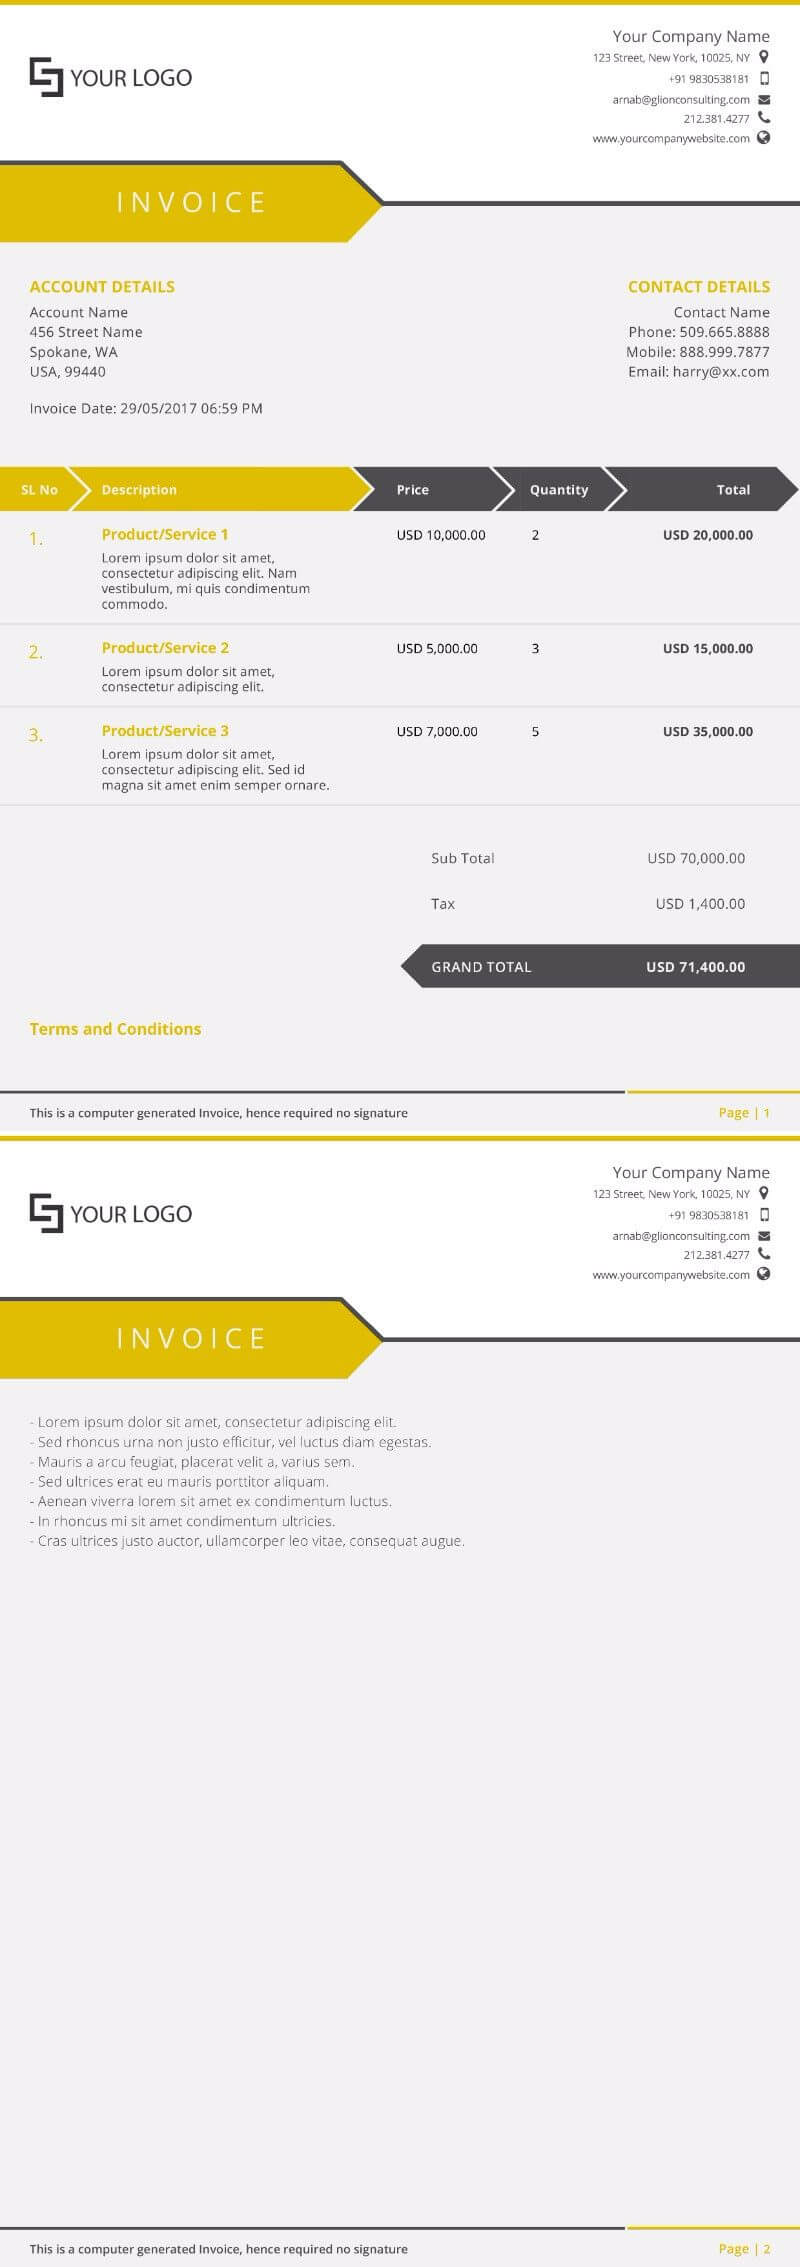 1500030477_INV-FLAMINGOS-YELLOW-DFBD00-1.png